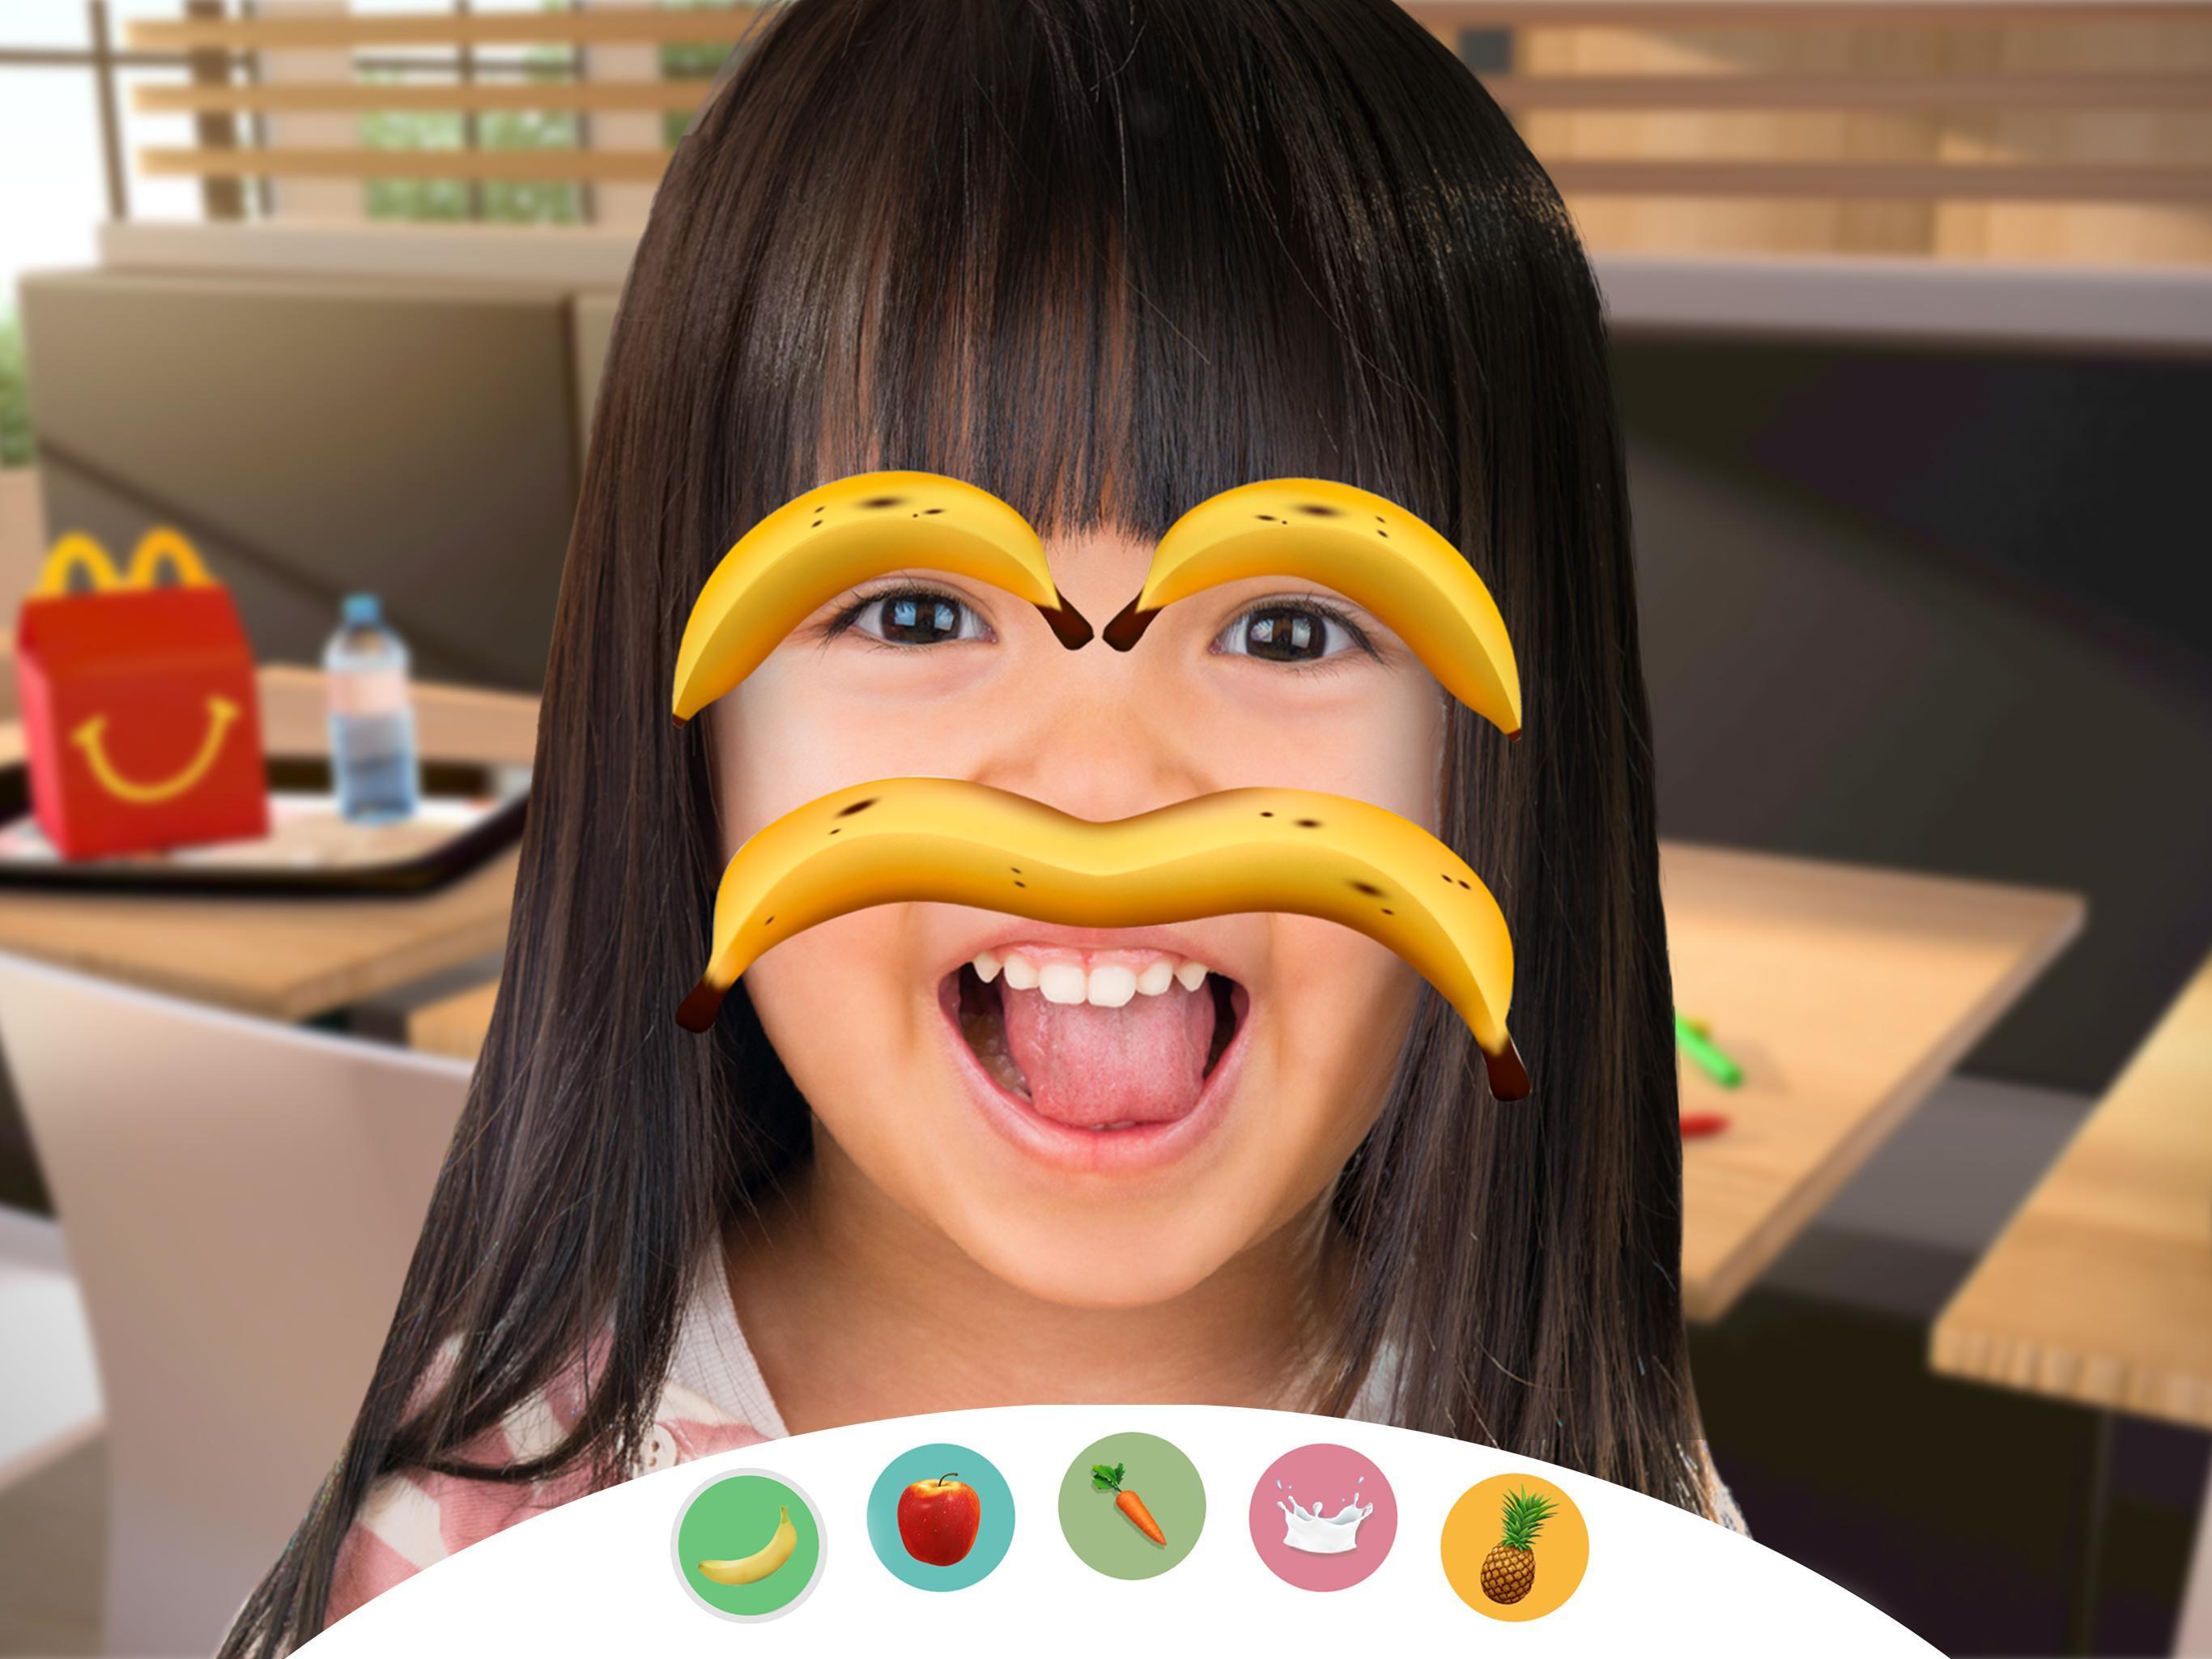 McDonald's Happy Meal App - MEA 9.5.0 Screenshot 11